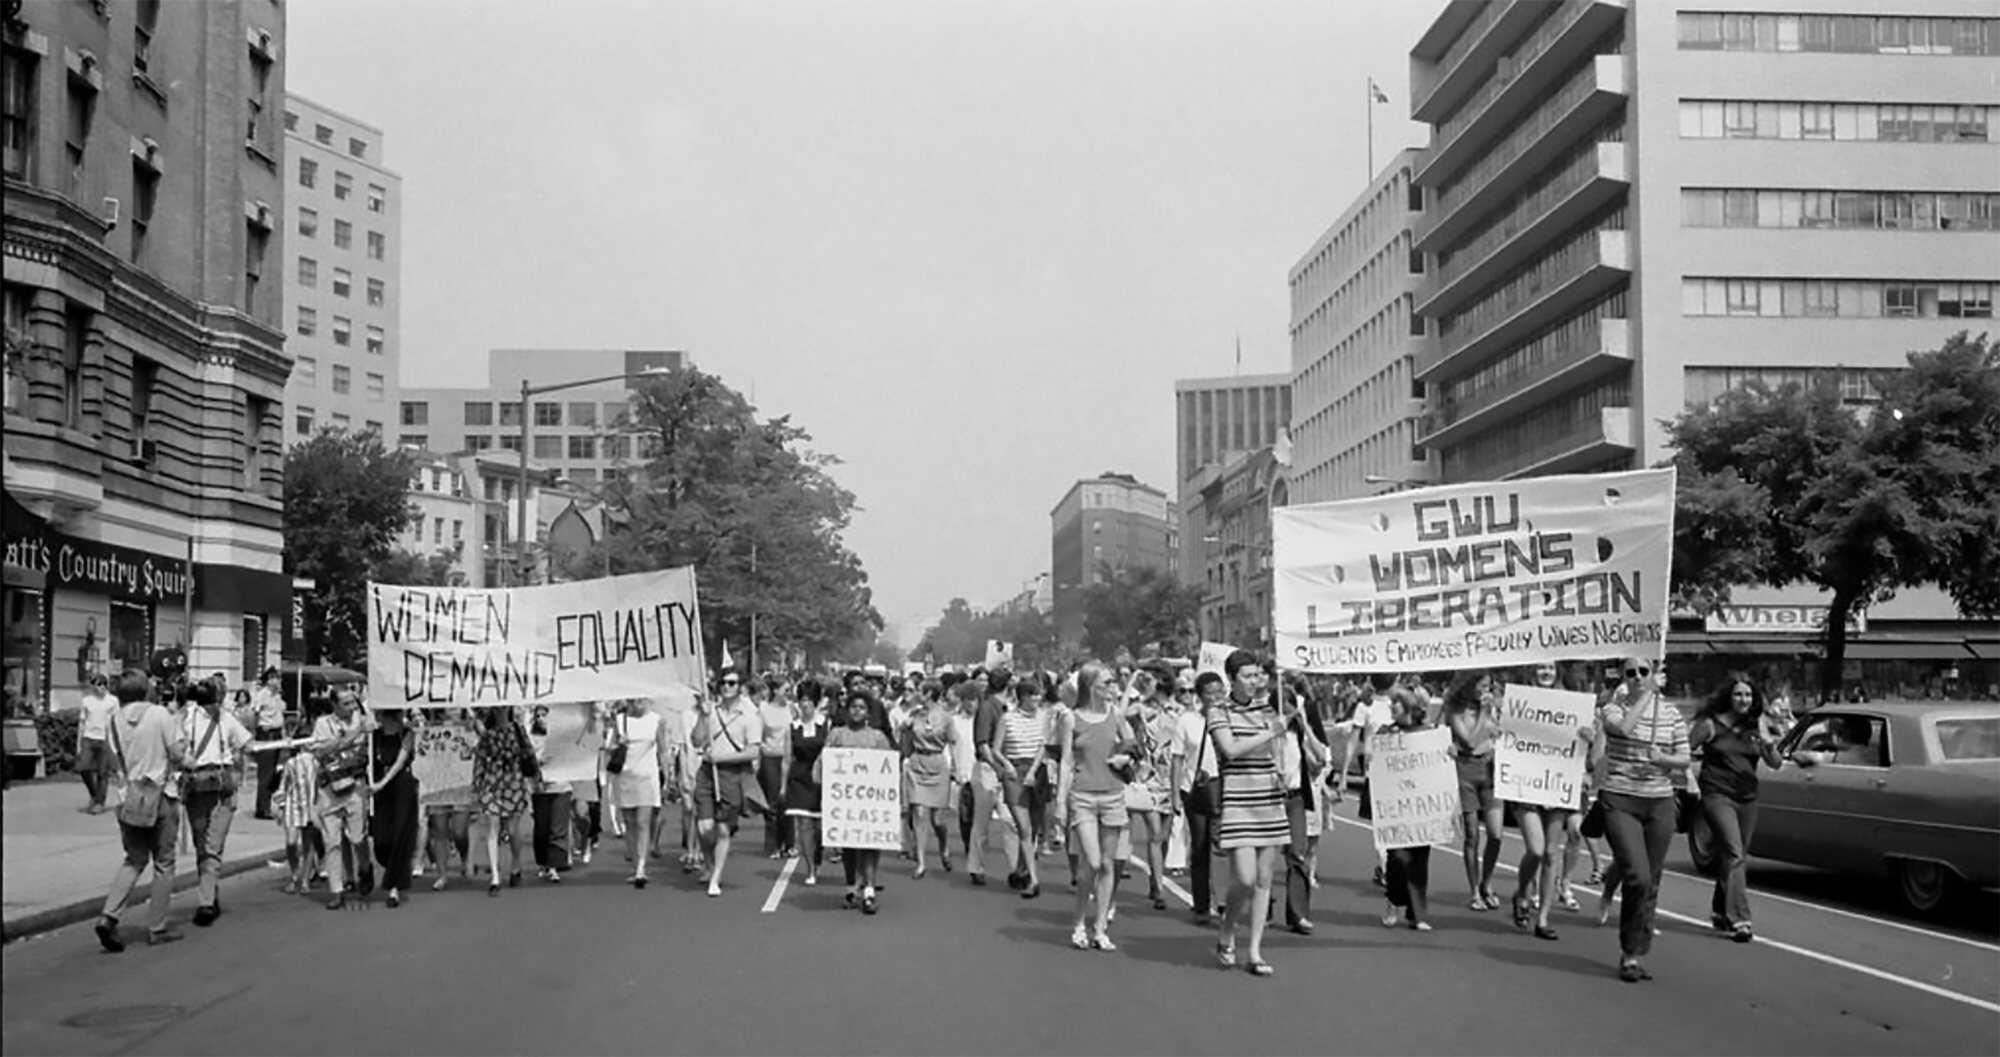 Pill-Women-liberation-LOC-1970-Washington-DC.jpg